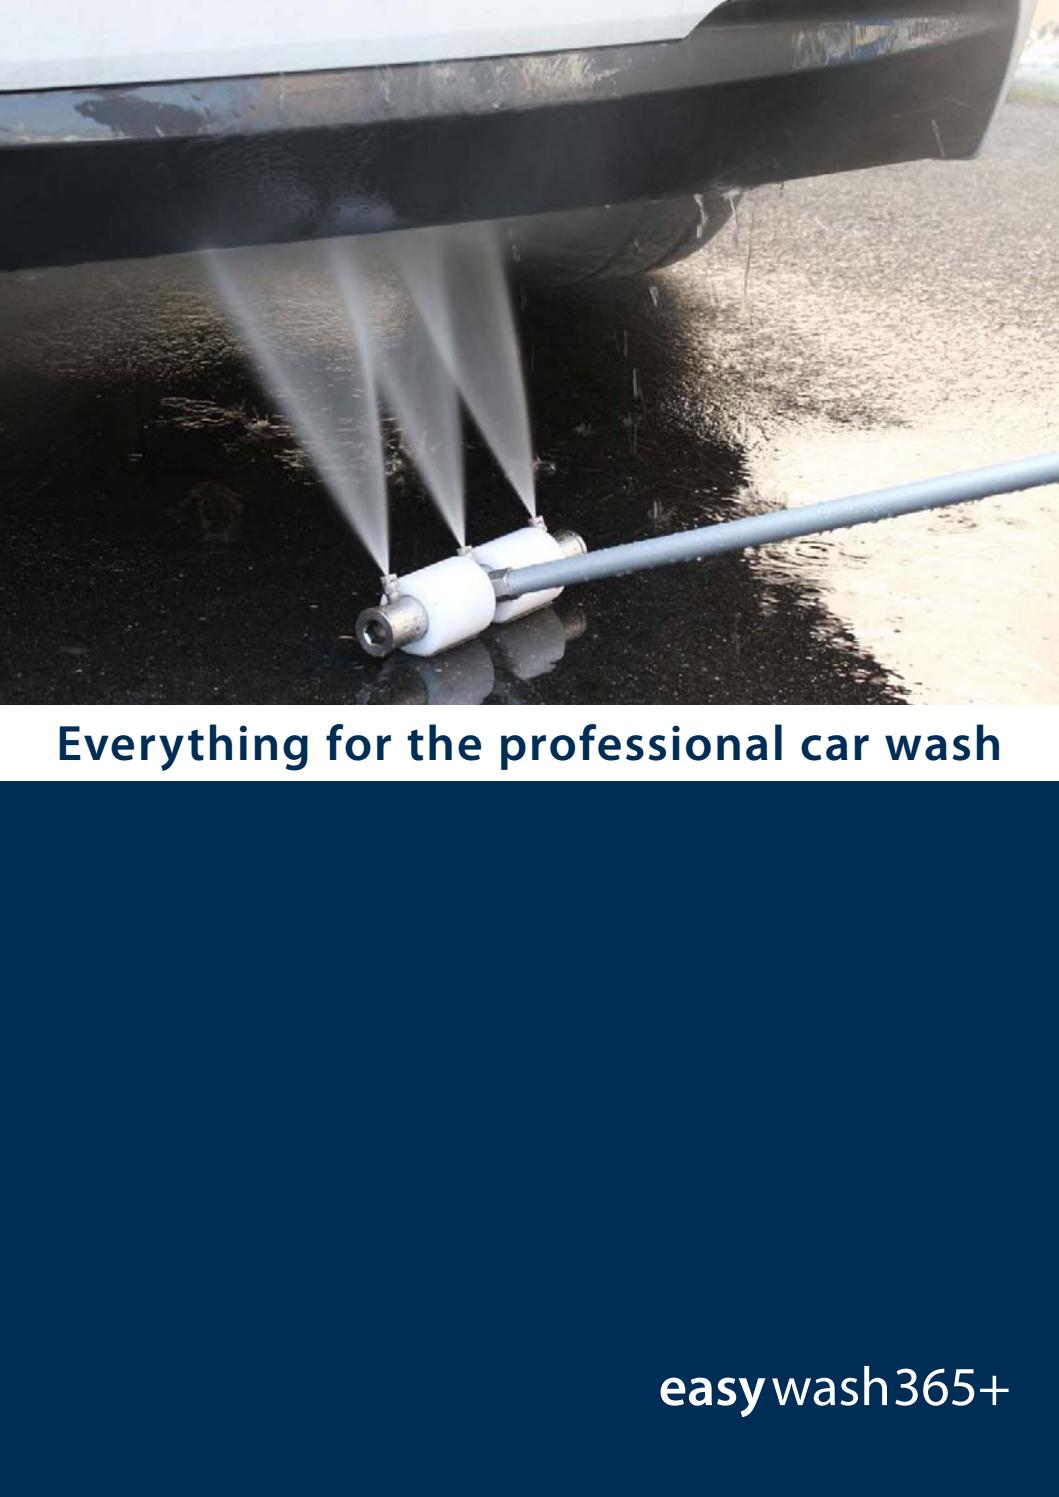 2x UNIVERSAL PVC WASCHBÜRSTE CLEANING BRUSH